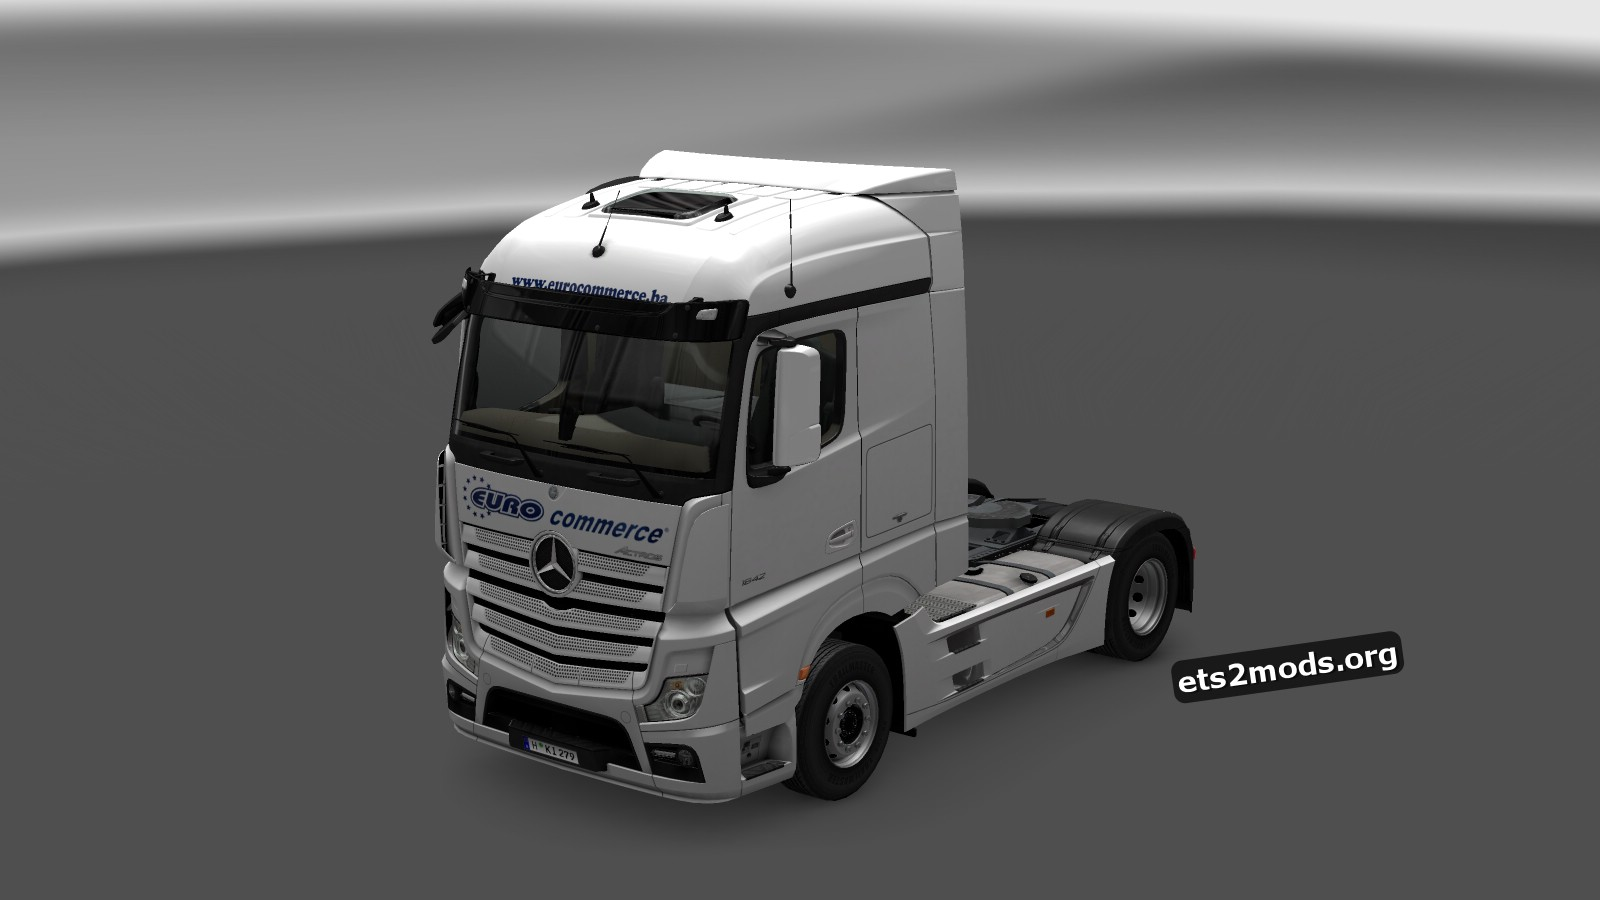 Euro Commerce Skin for Mercedes MP4